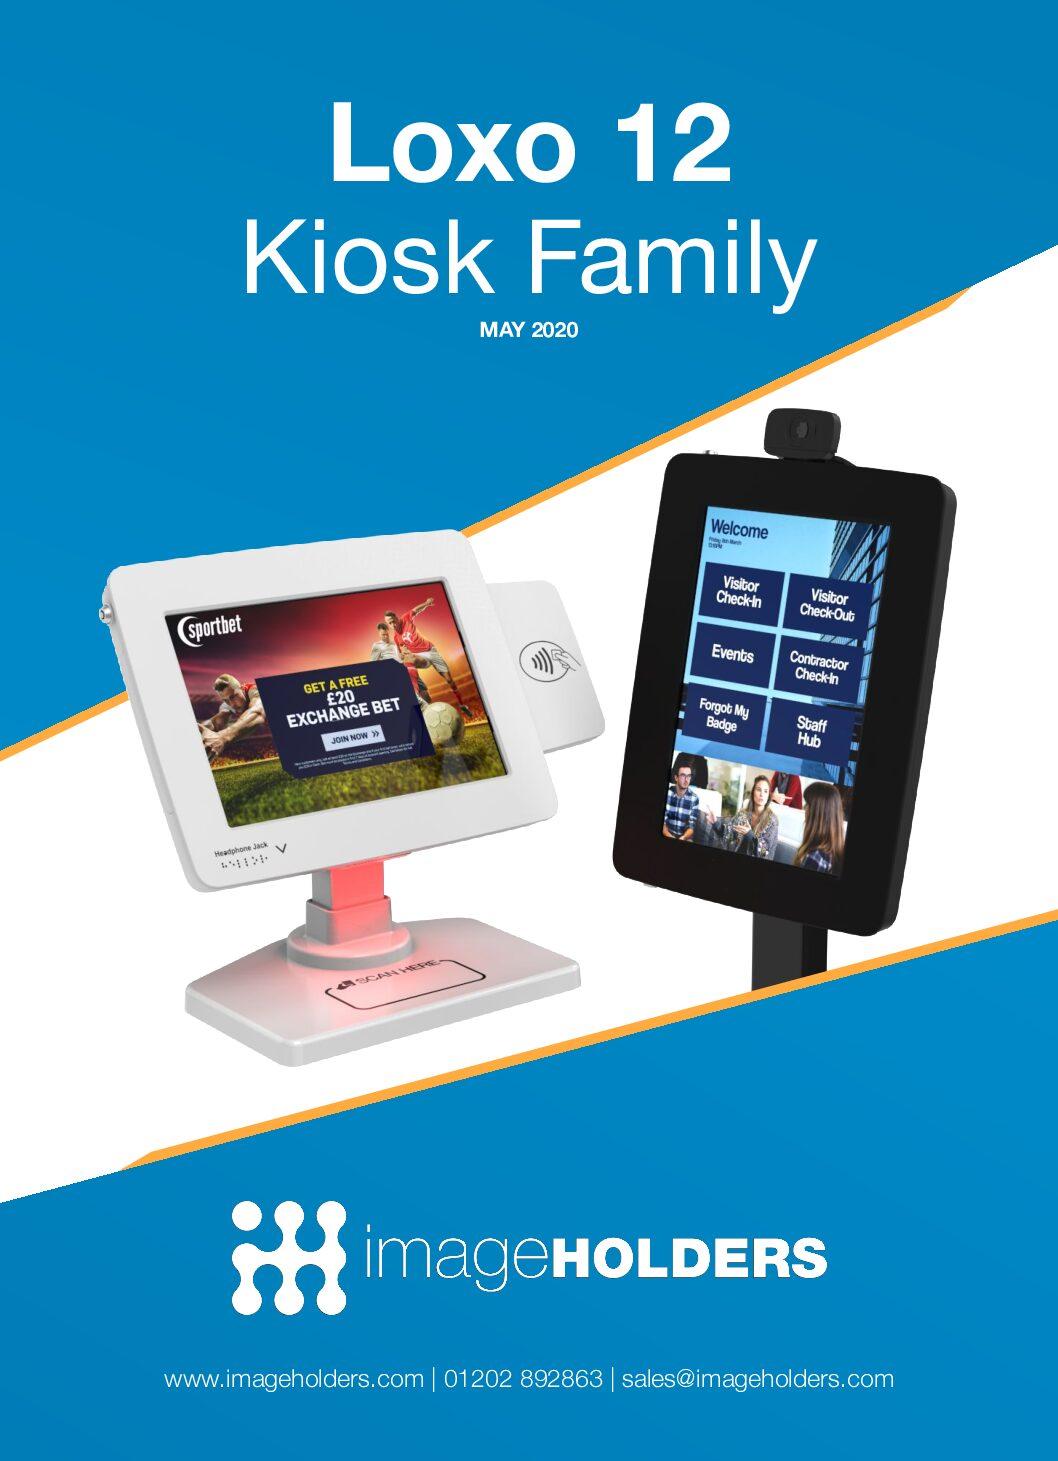 Loxo 12 Kiosk Family